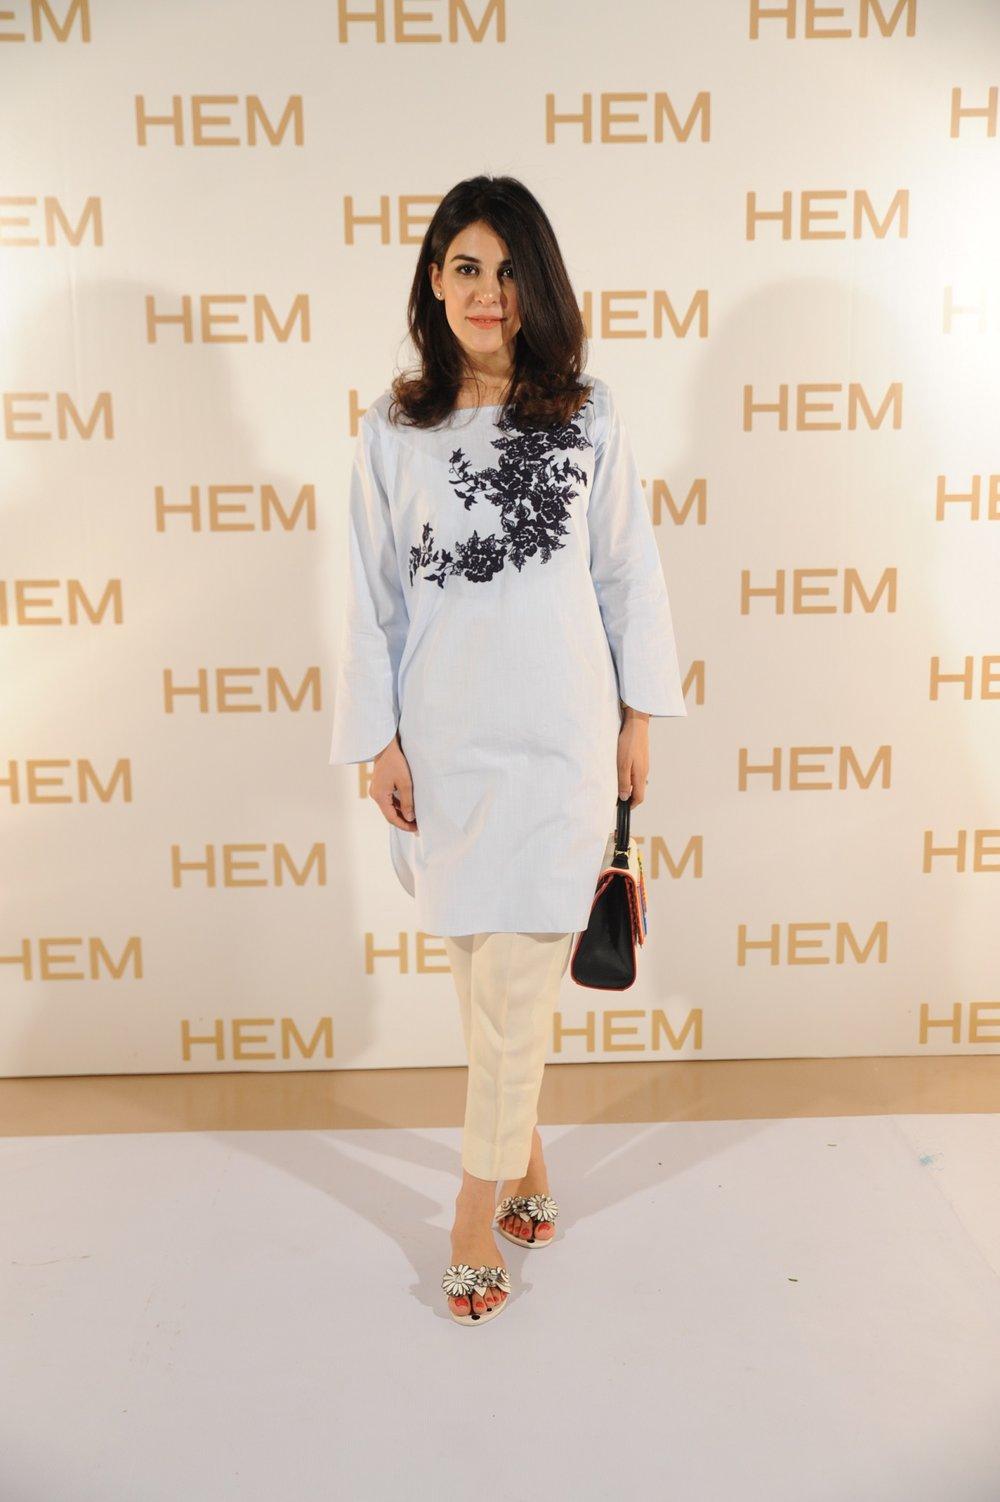 Aymen Hikmat wearing HEM.JPG